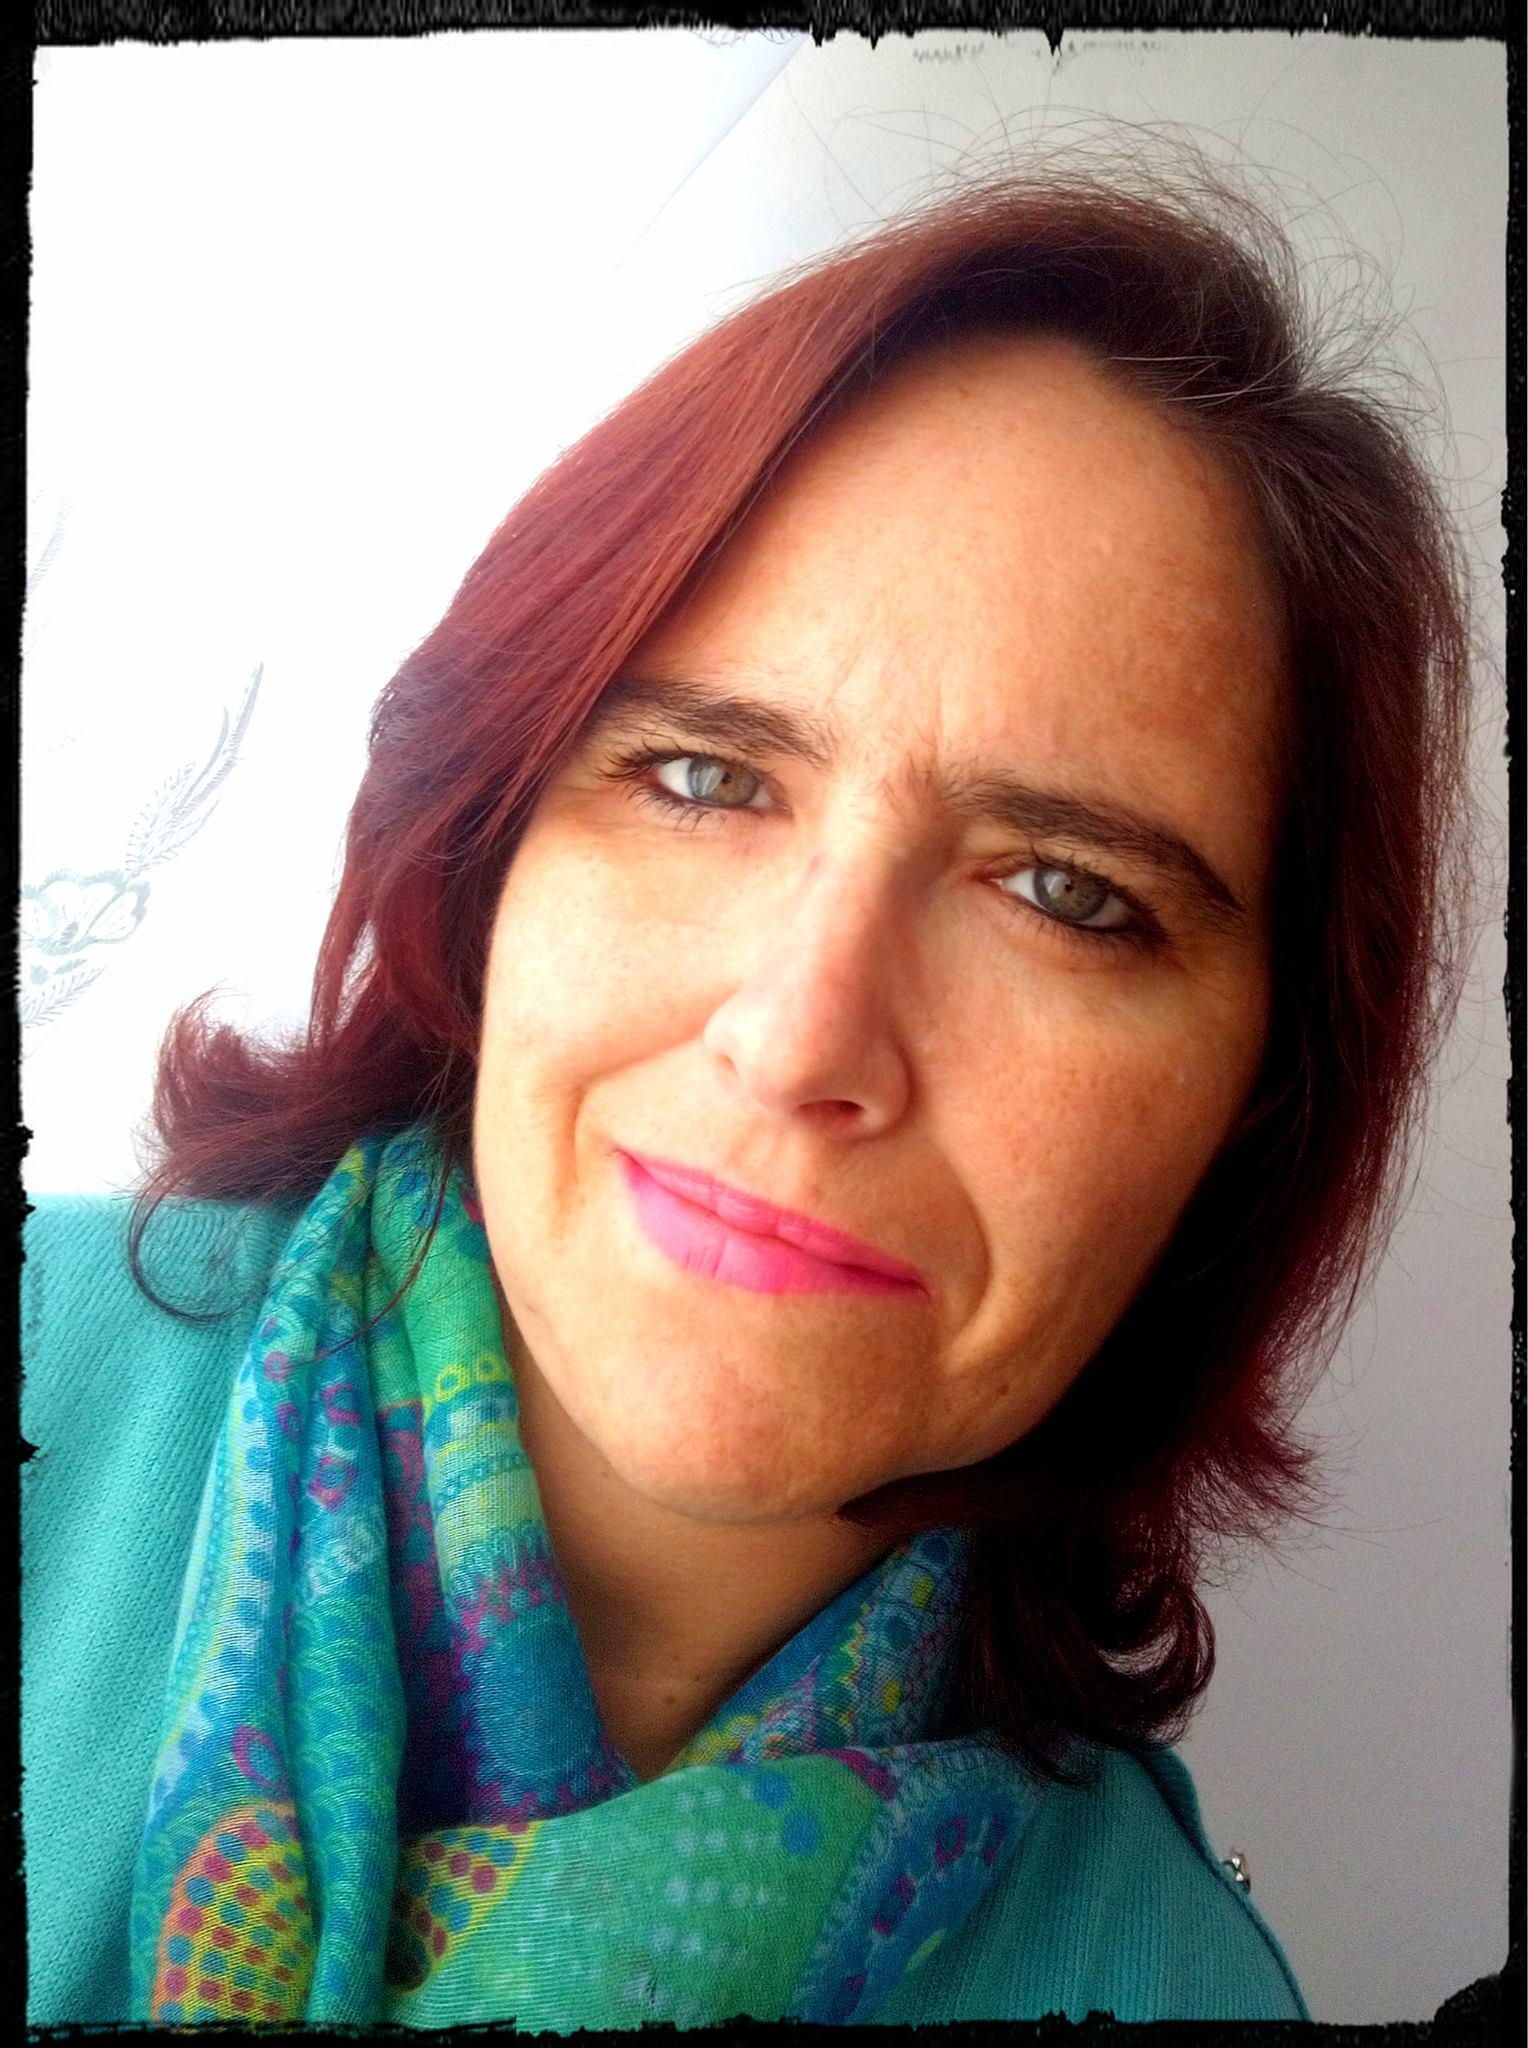 Sara Cristina Fonseca e Silva